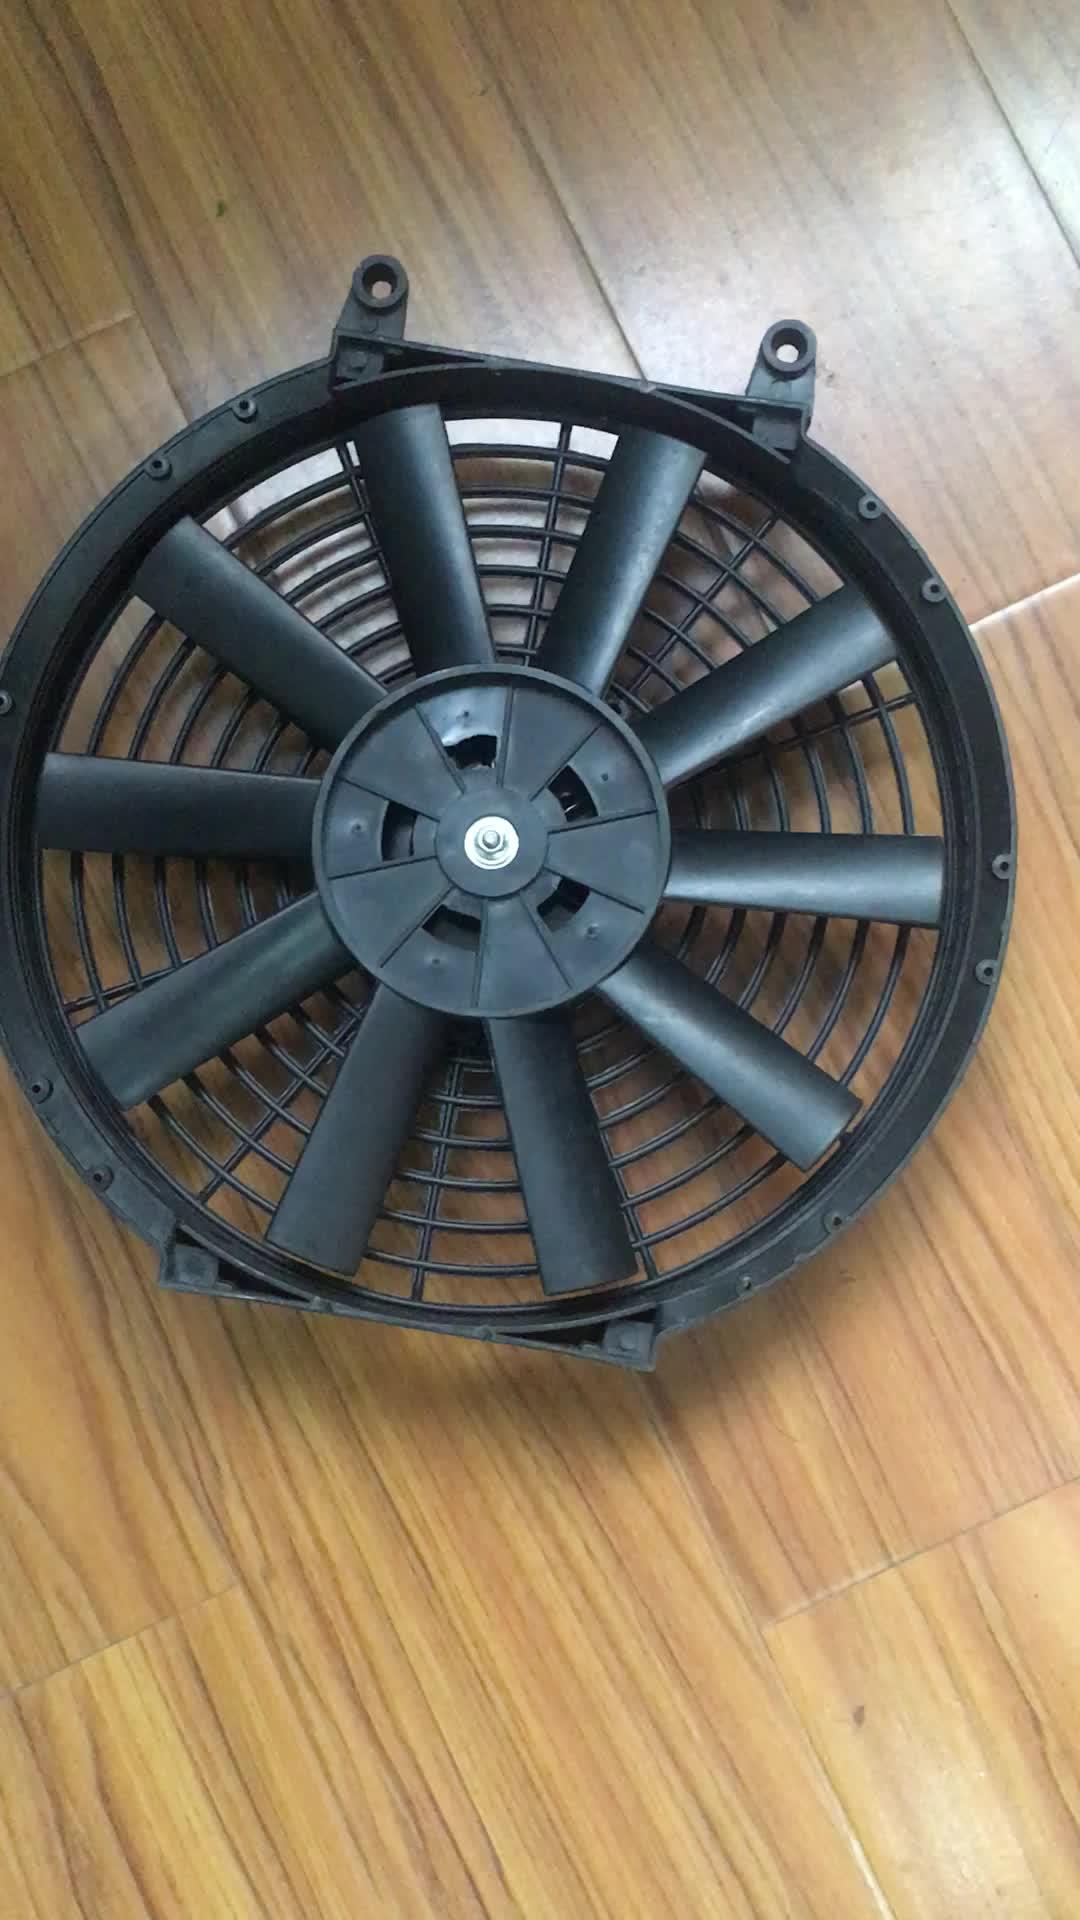 12 Volt Car Fan Straight Curve Electric Universal Fan For